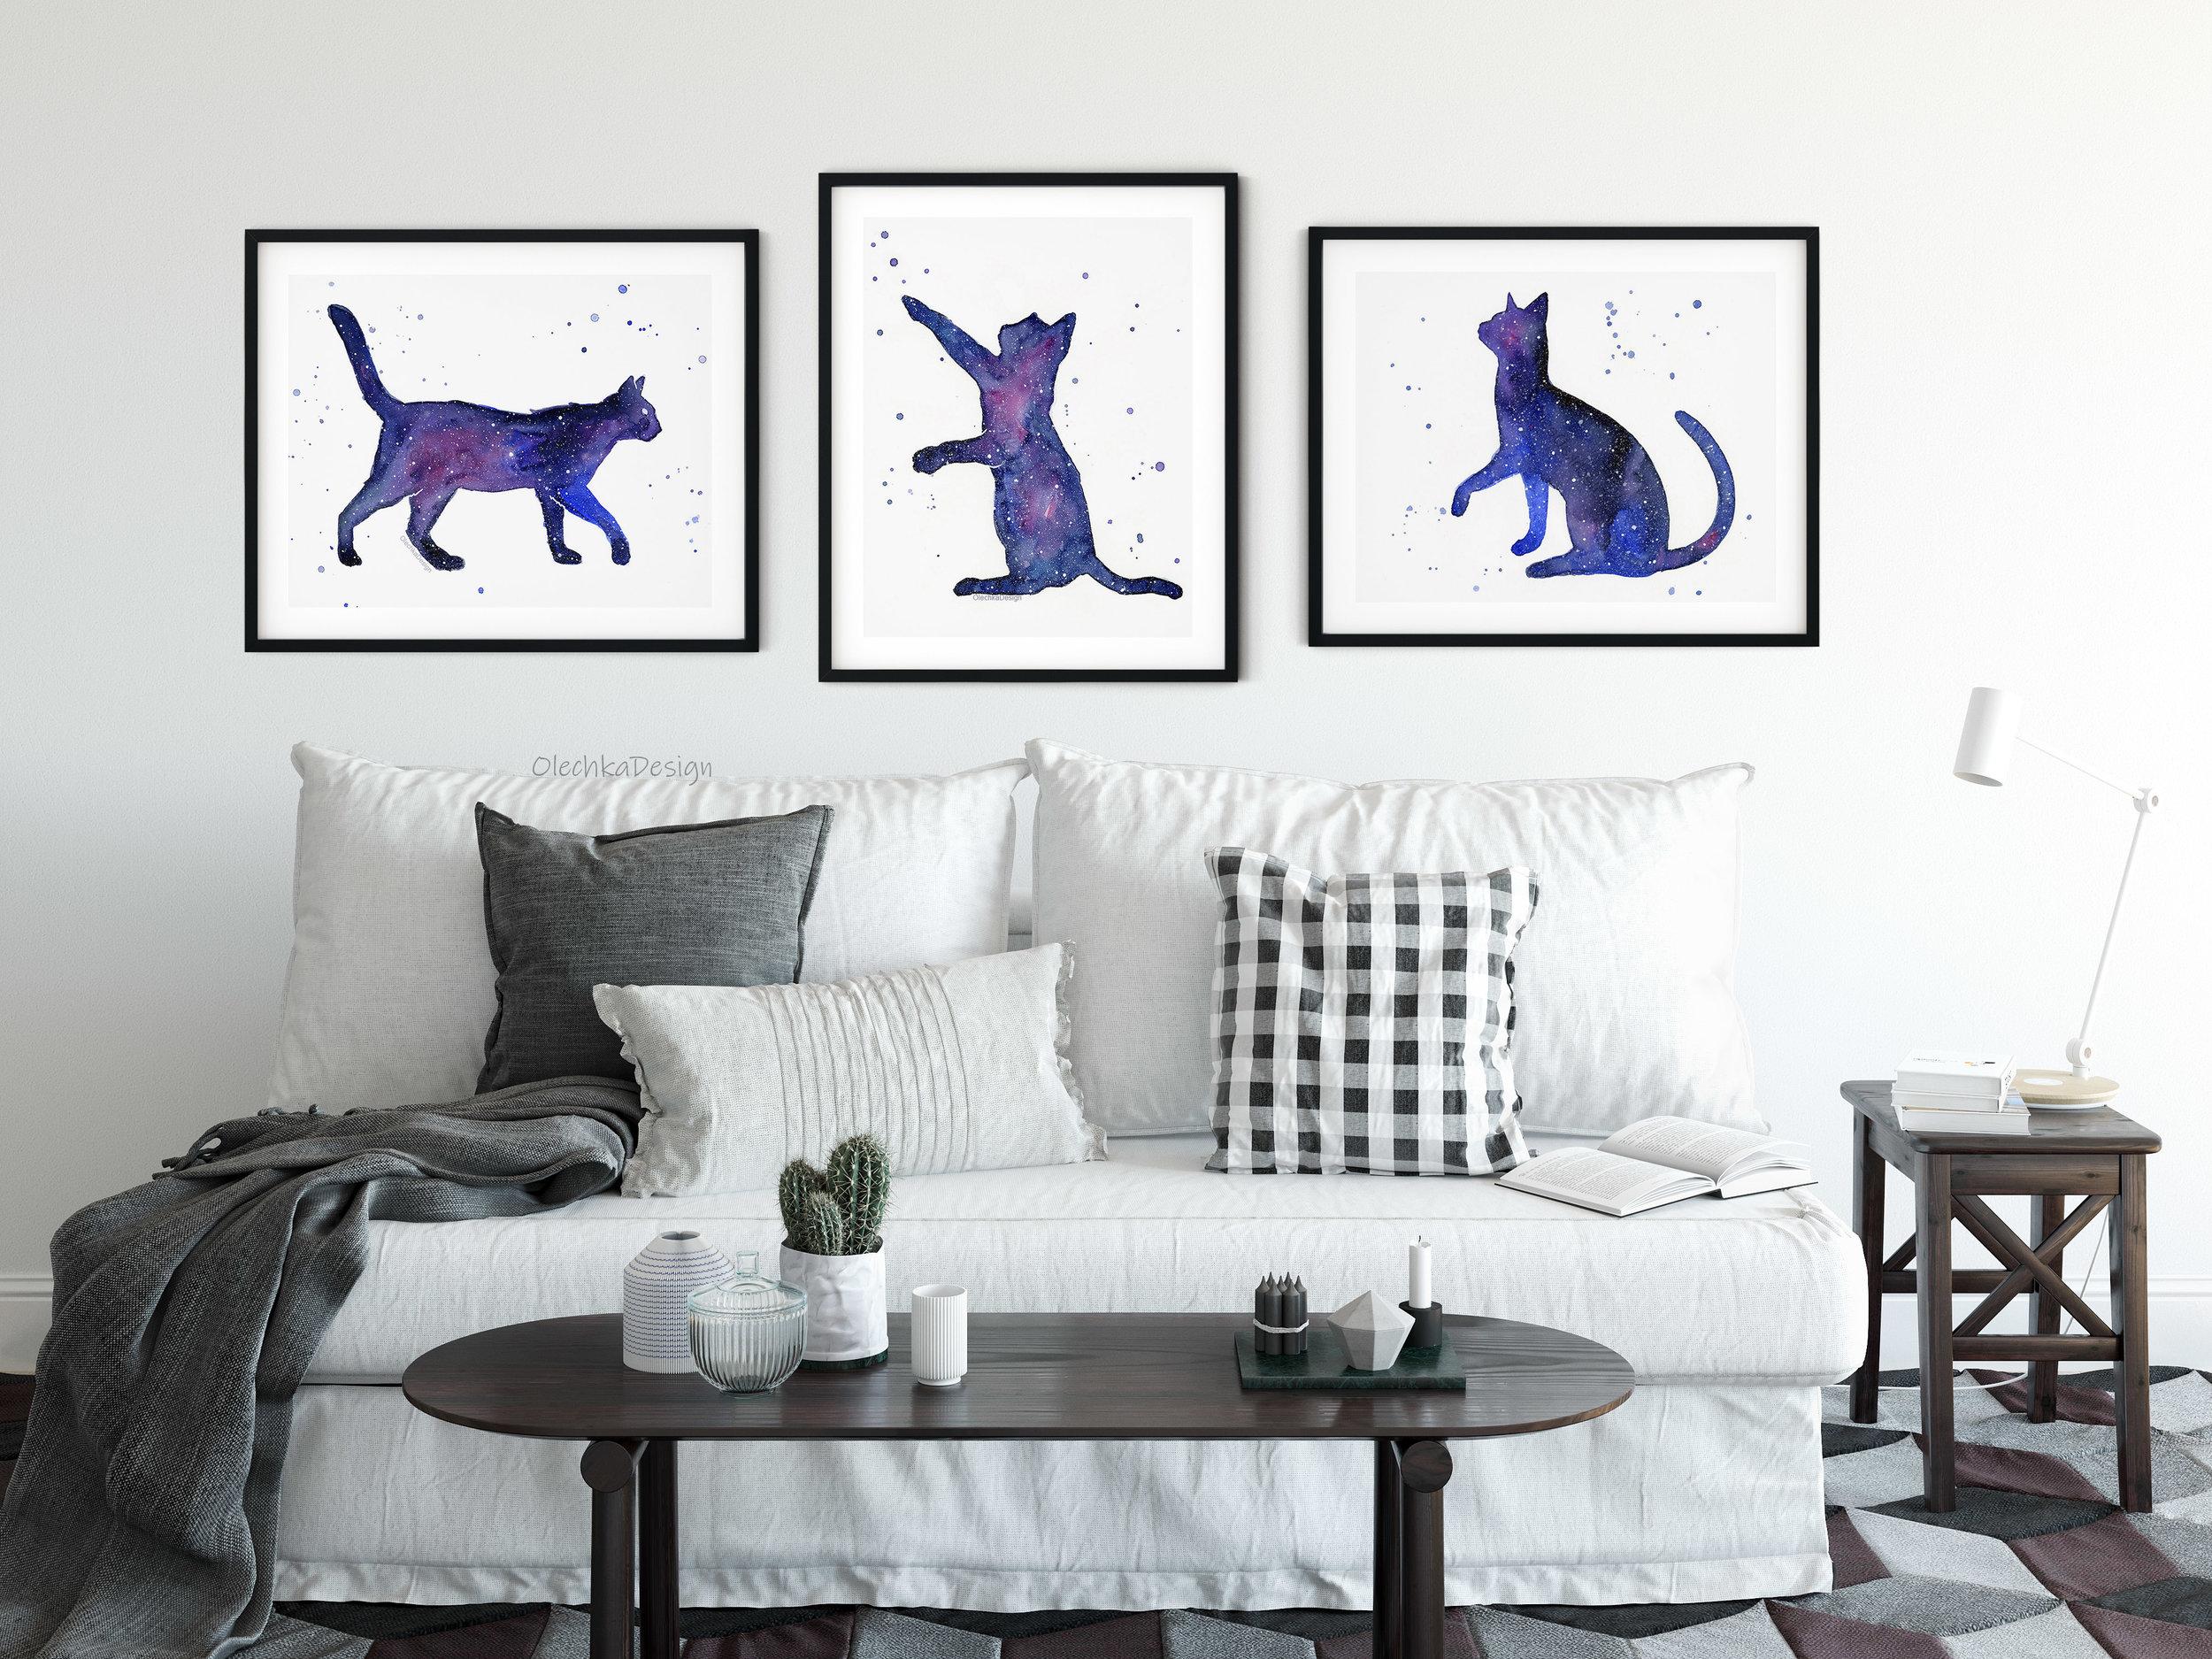 galaxy-cat-silhouette-art.jpg